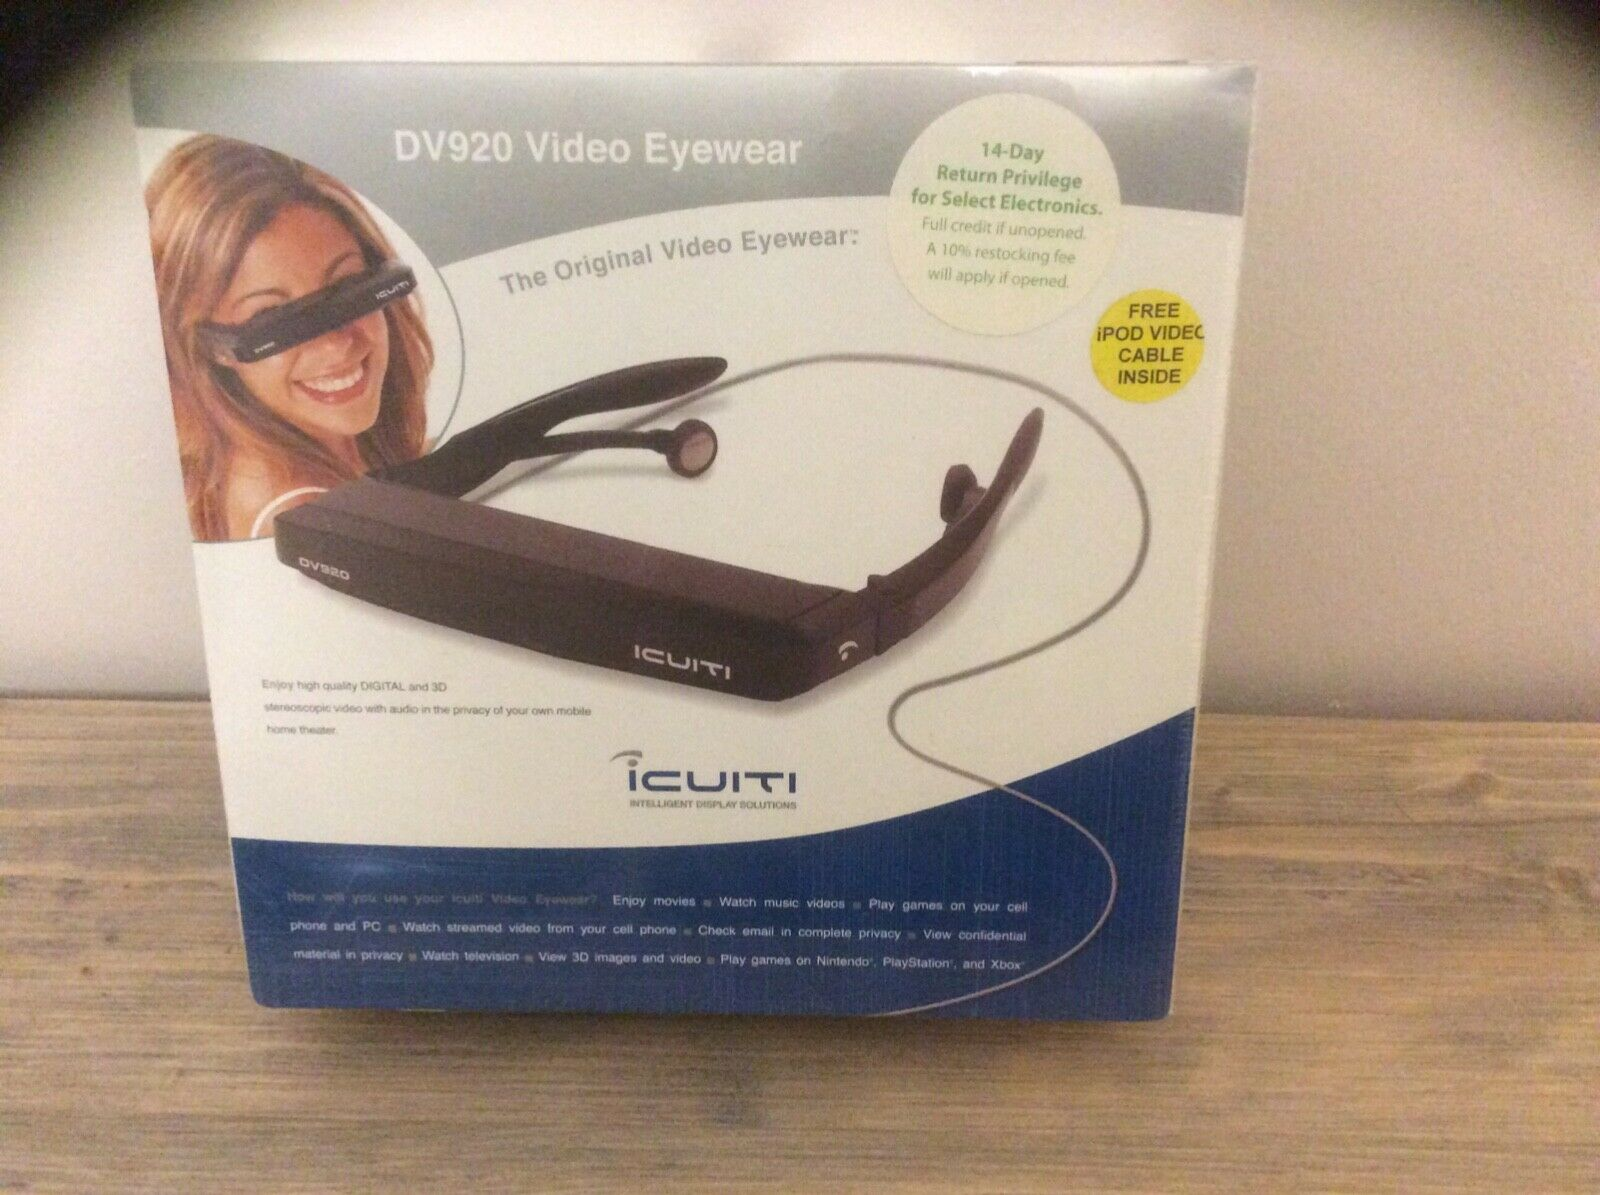 iCUITI DV920 Video Eyewear new unopened